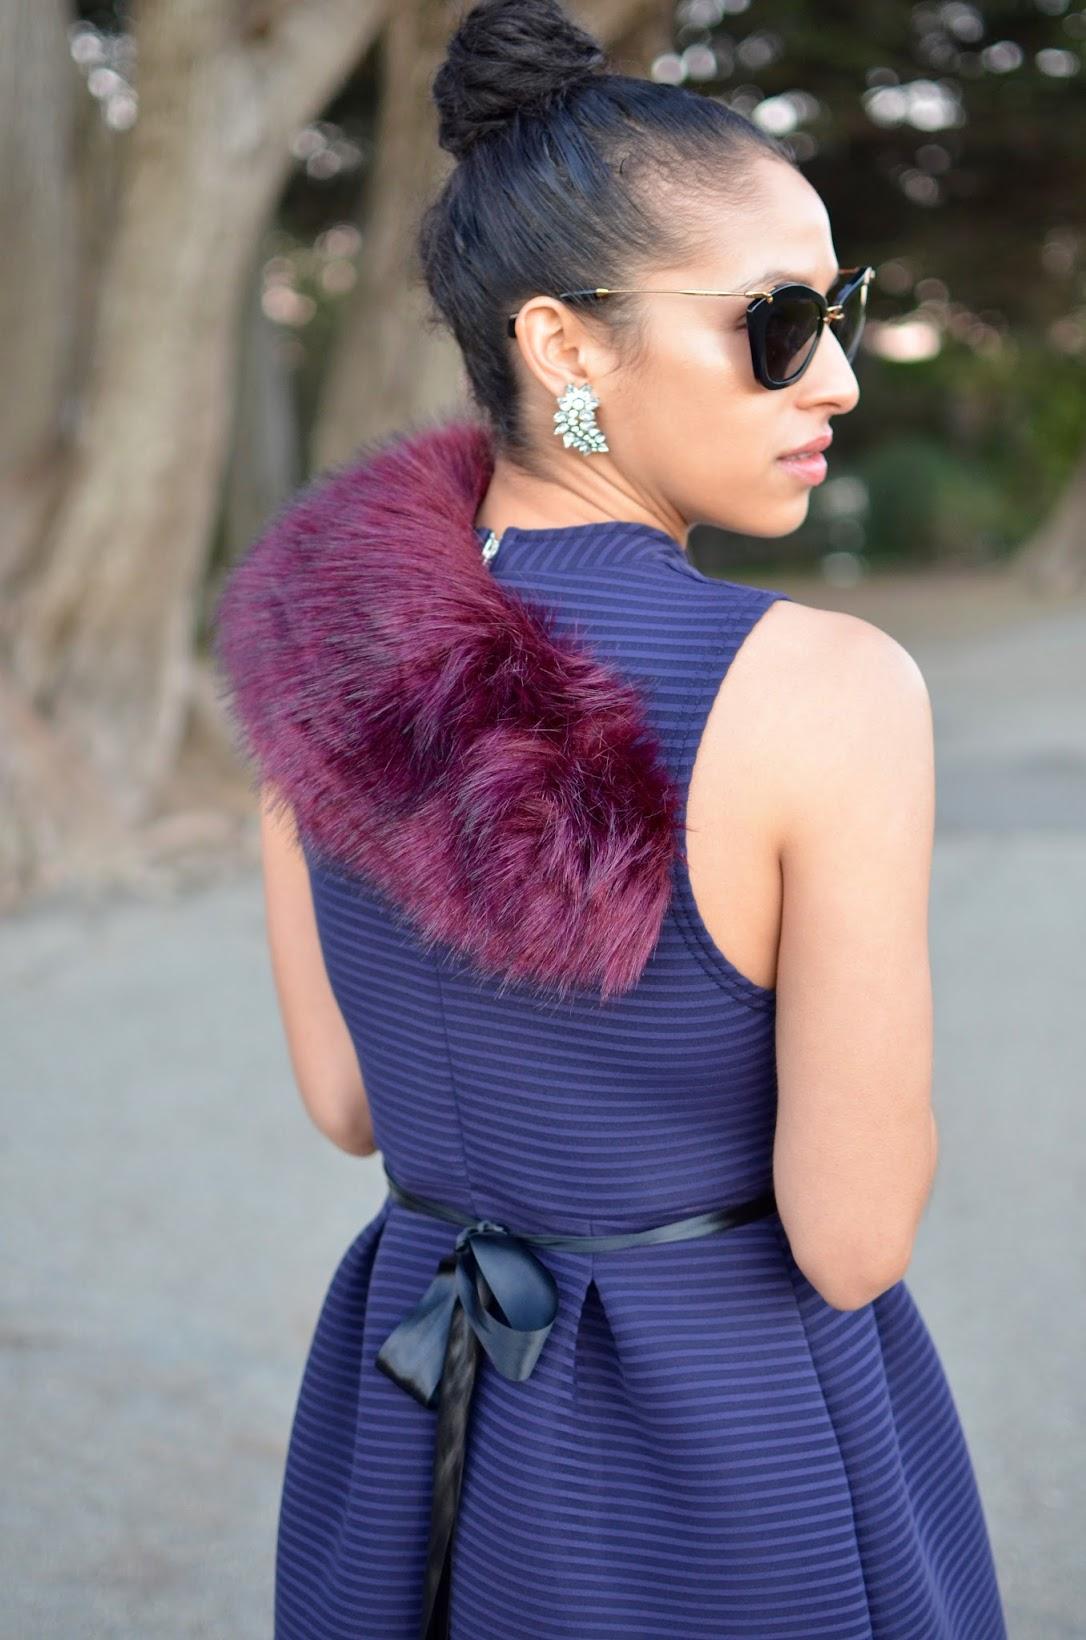 Allergic To Vanilla, boohoo dress, Sophia Webster Coco Flamingo heels, vintage earrings, ladylike dress, feminine vibe, SF style, how to style a ribbon, purple faux fur stole, Miu Miu cat-eye sunglasses